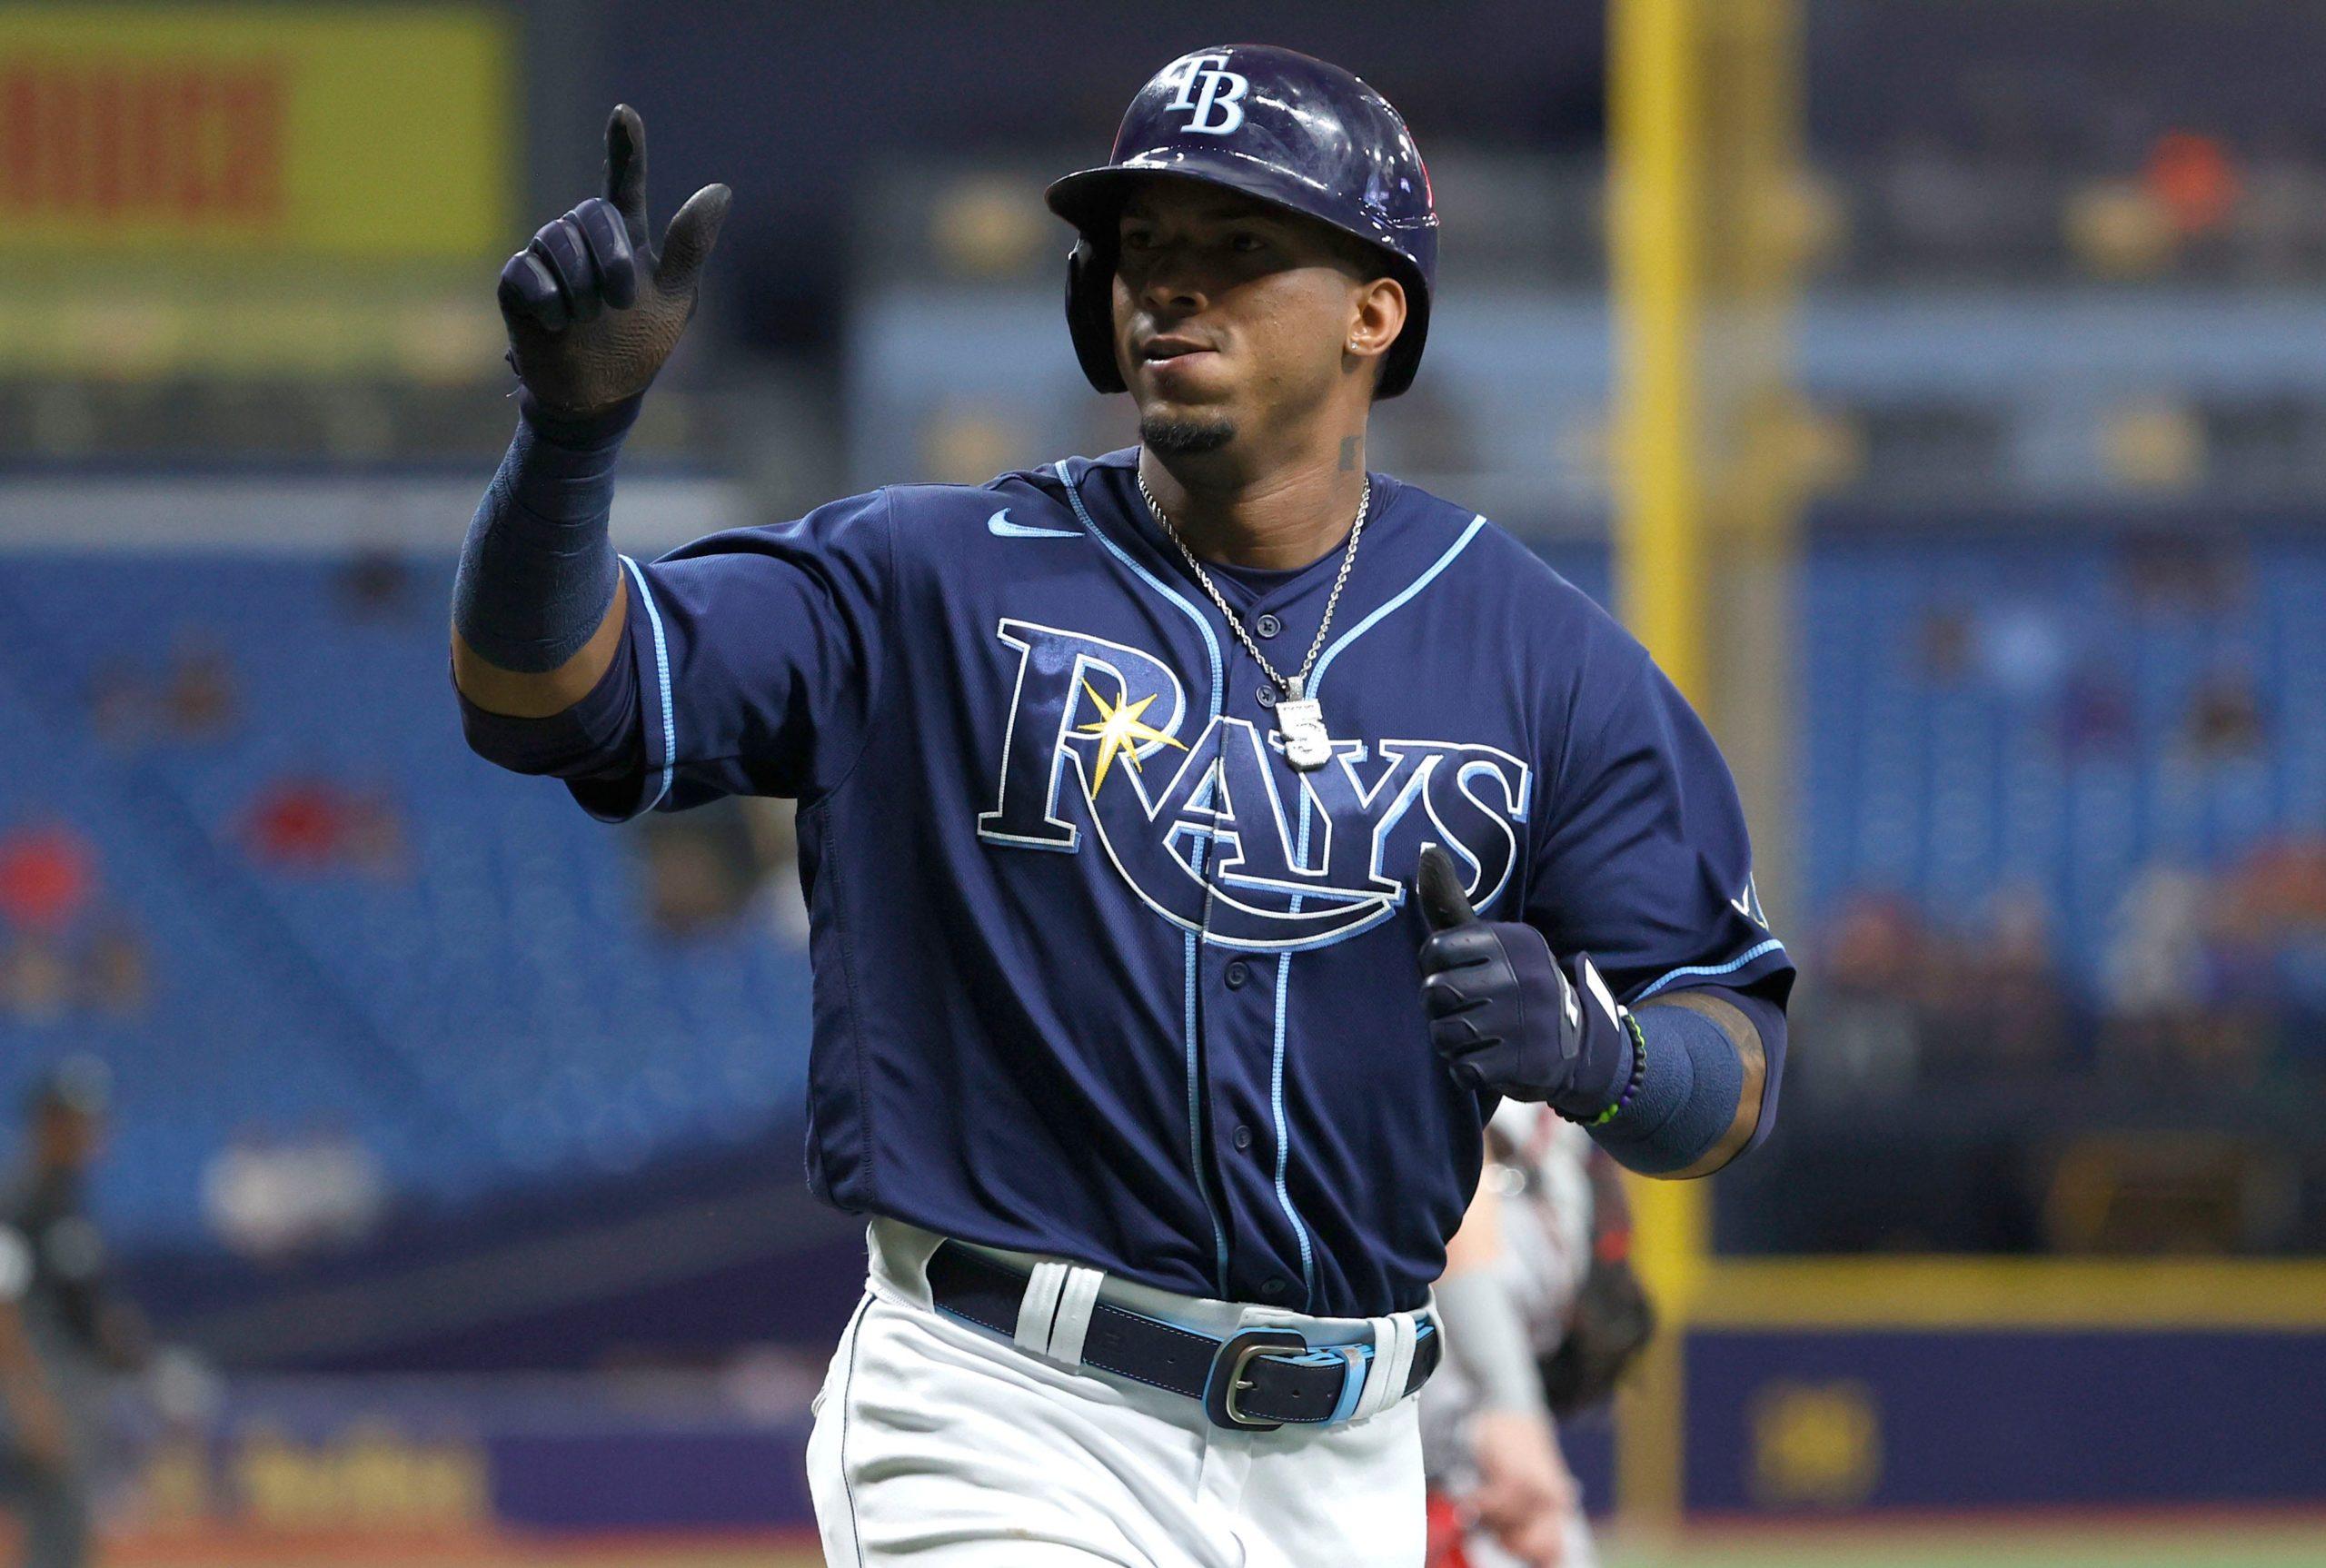 Tampa Bay's Wander Franco Has Passed Mickey Mantle's On-base Streak